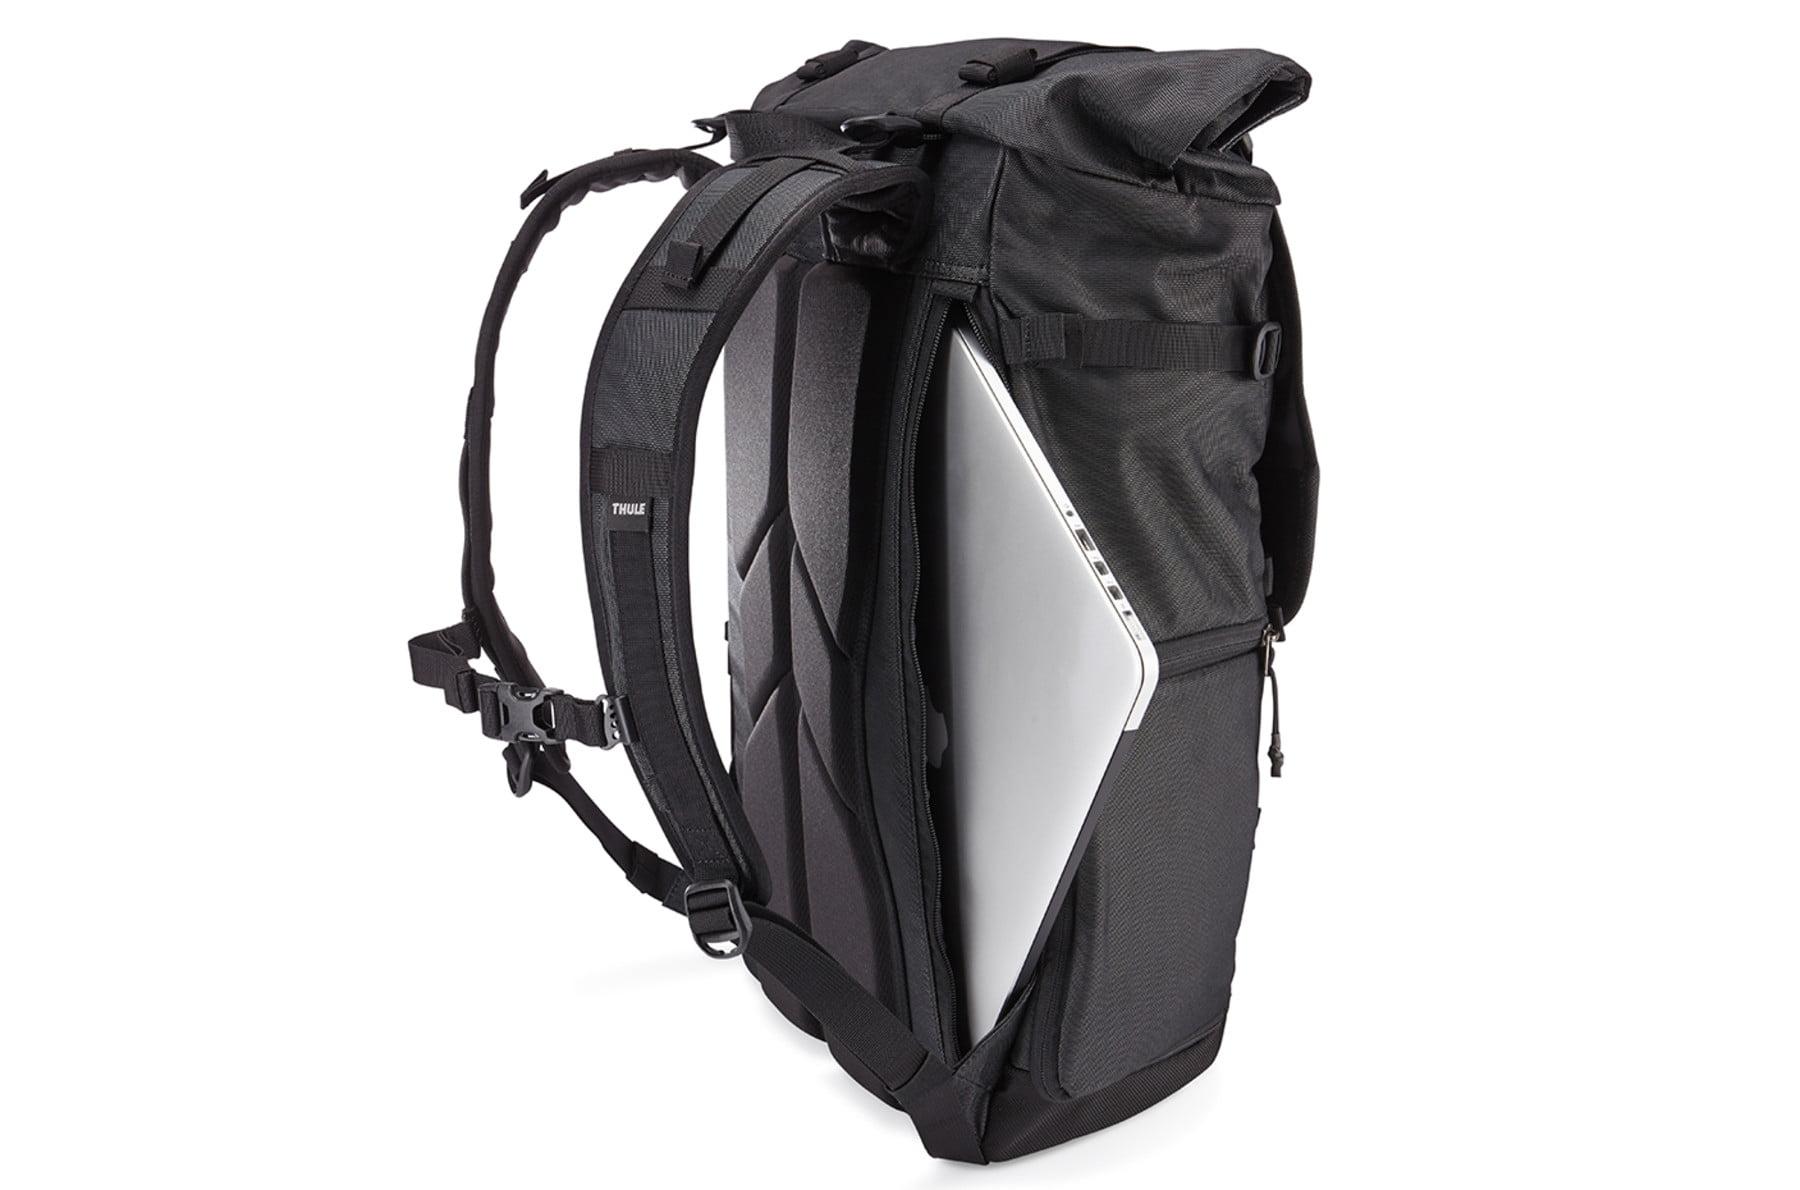 Rucsac foto Thule Covert DSLR Backpack Dark Shadow 8